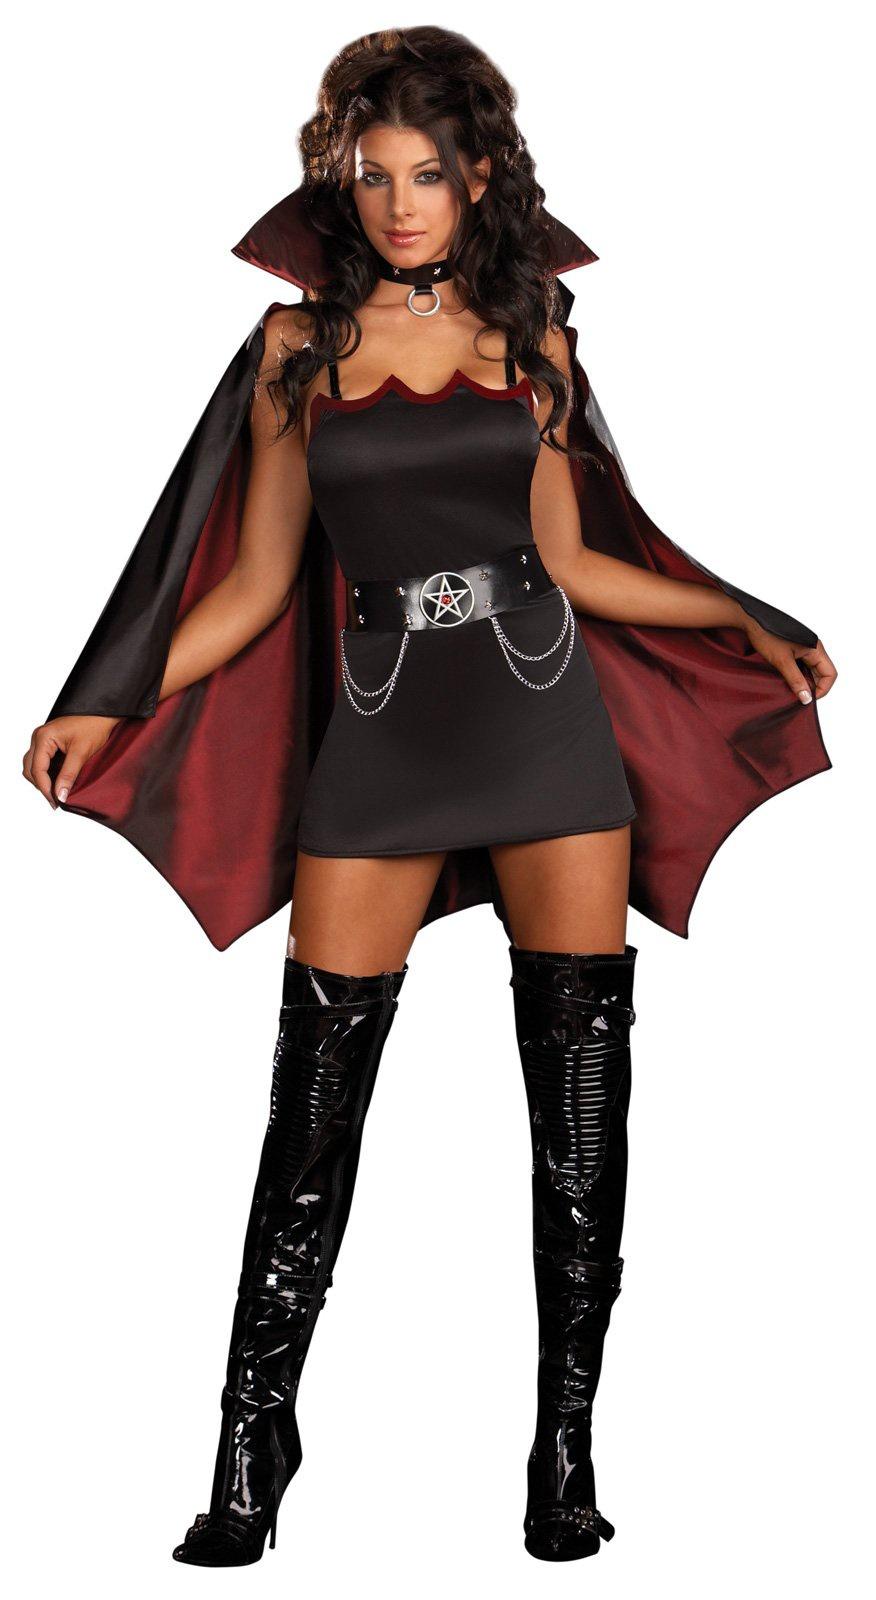 Fang Banging Vampire Costume